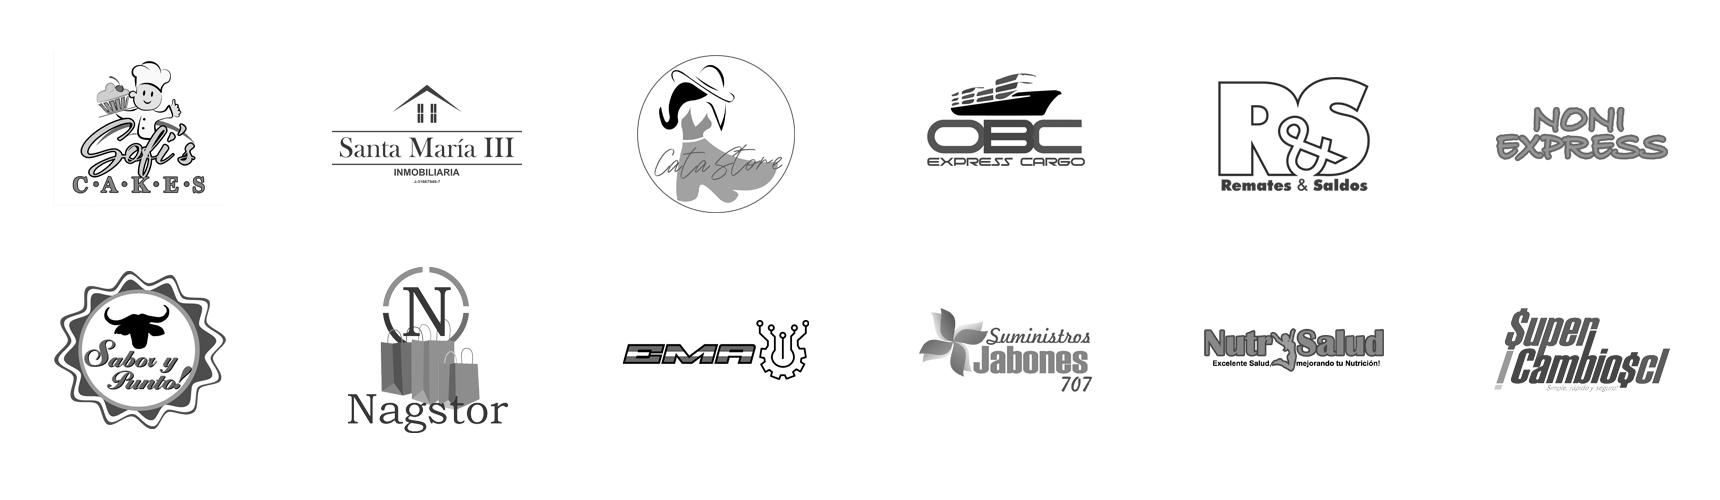 Sofi's Cakes, Inmobiliaria Santa María III, Cata Store Italy, OBC Express Cargo, Remates & Saldos, Noni Express, Sabor y Punto!, Nagstor, EMA, Suministros Jabones 707 C.A., NutrySalud, SuperCambios CL